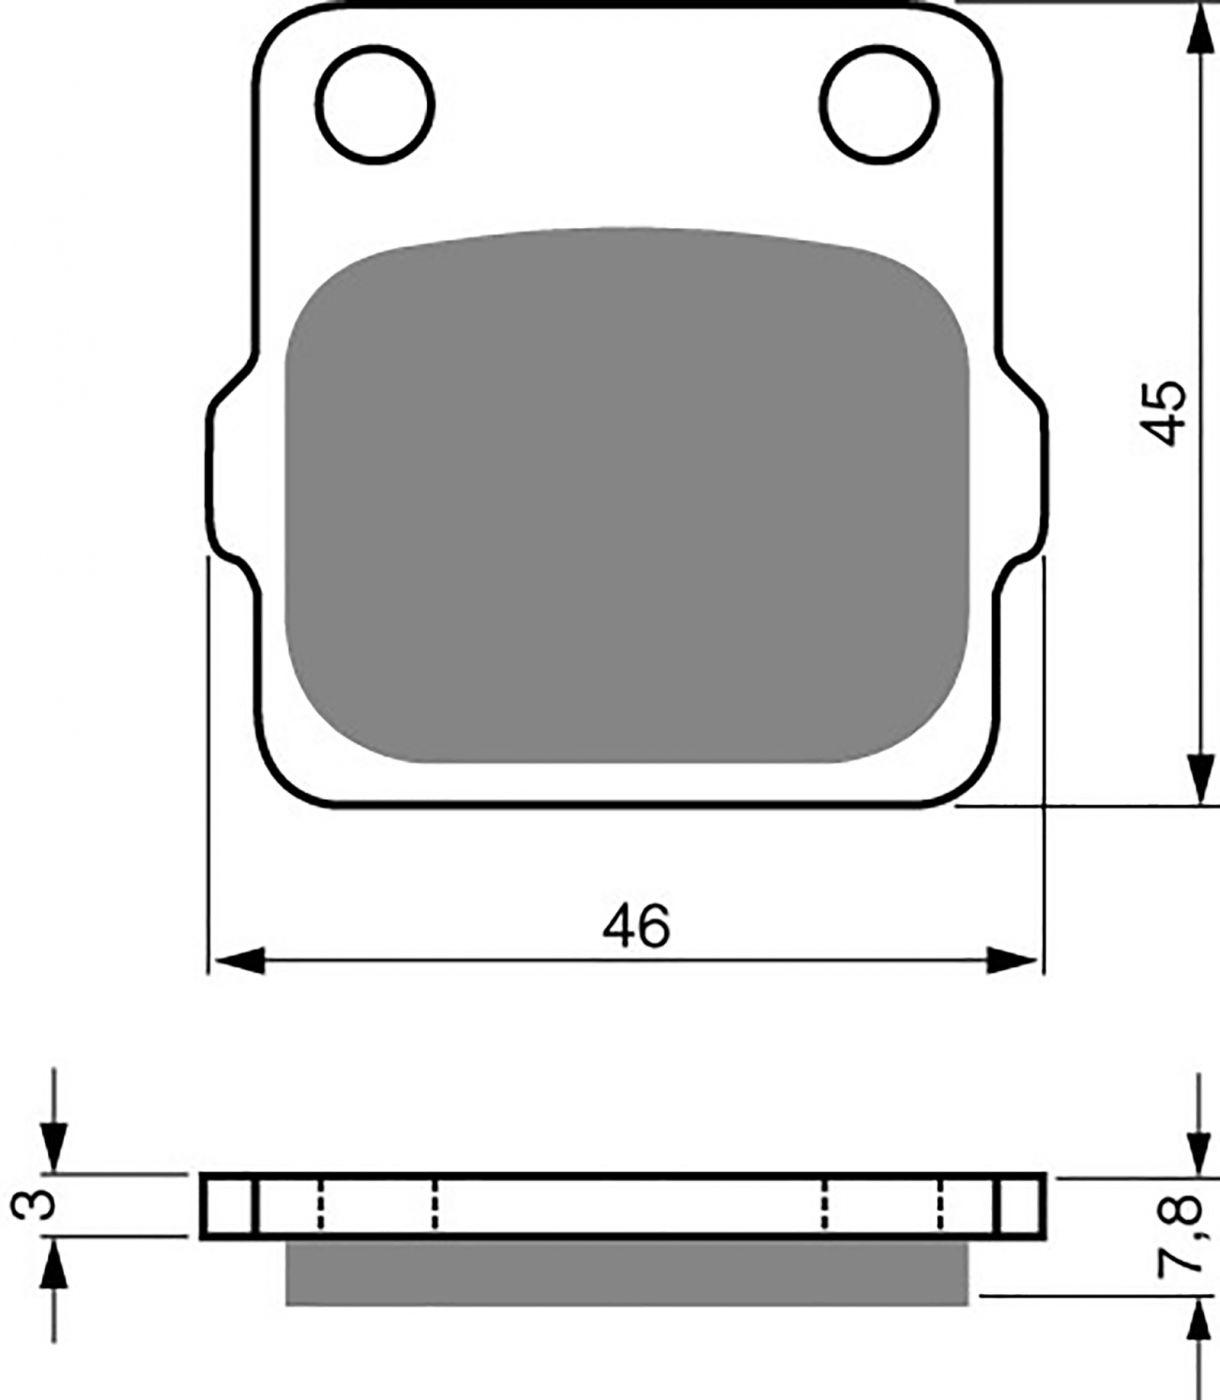 goldfren s33 brake pads - 700007GS image